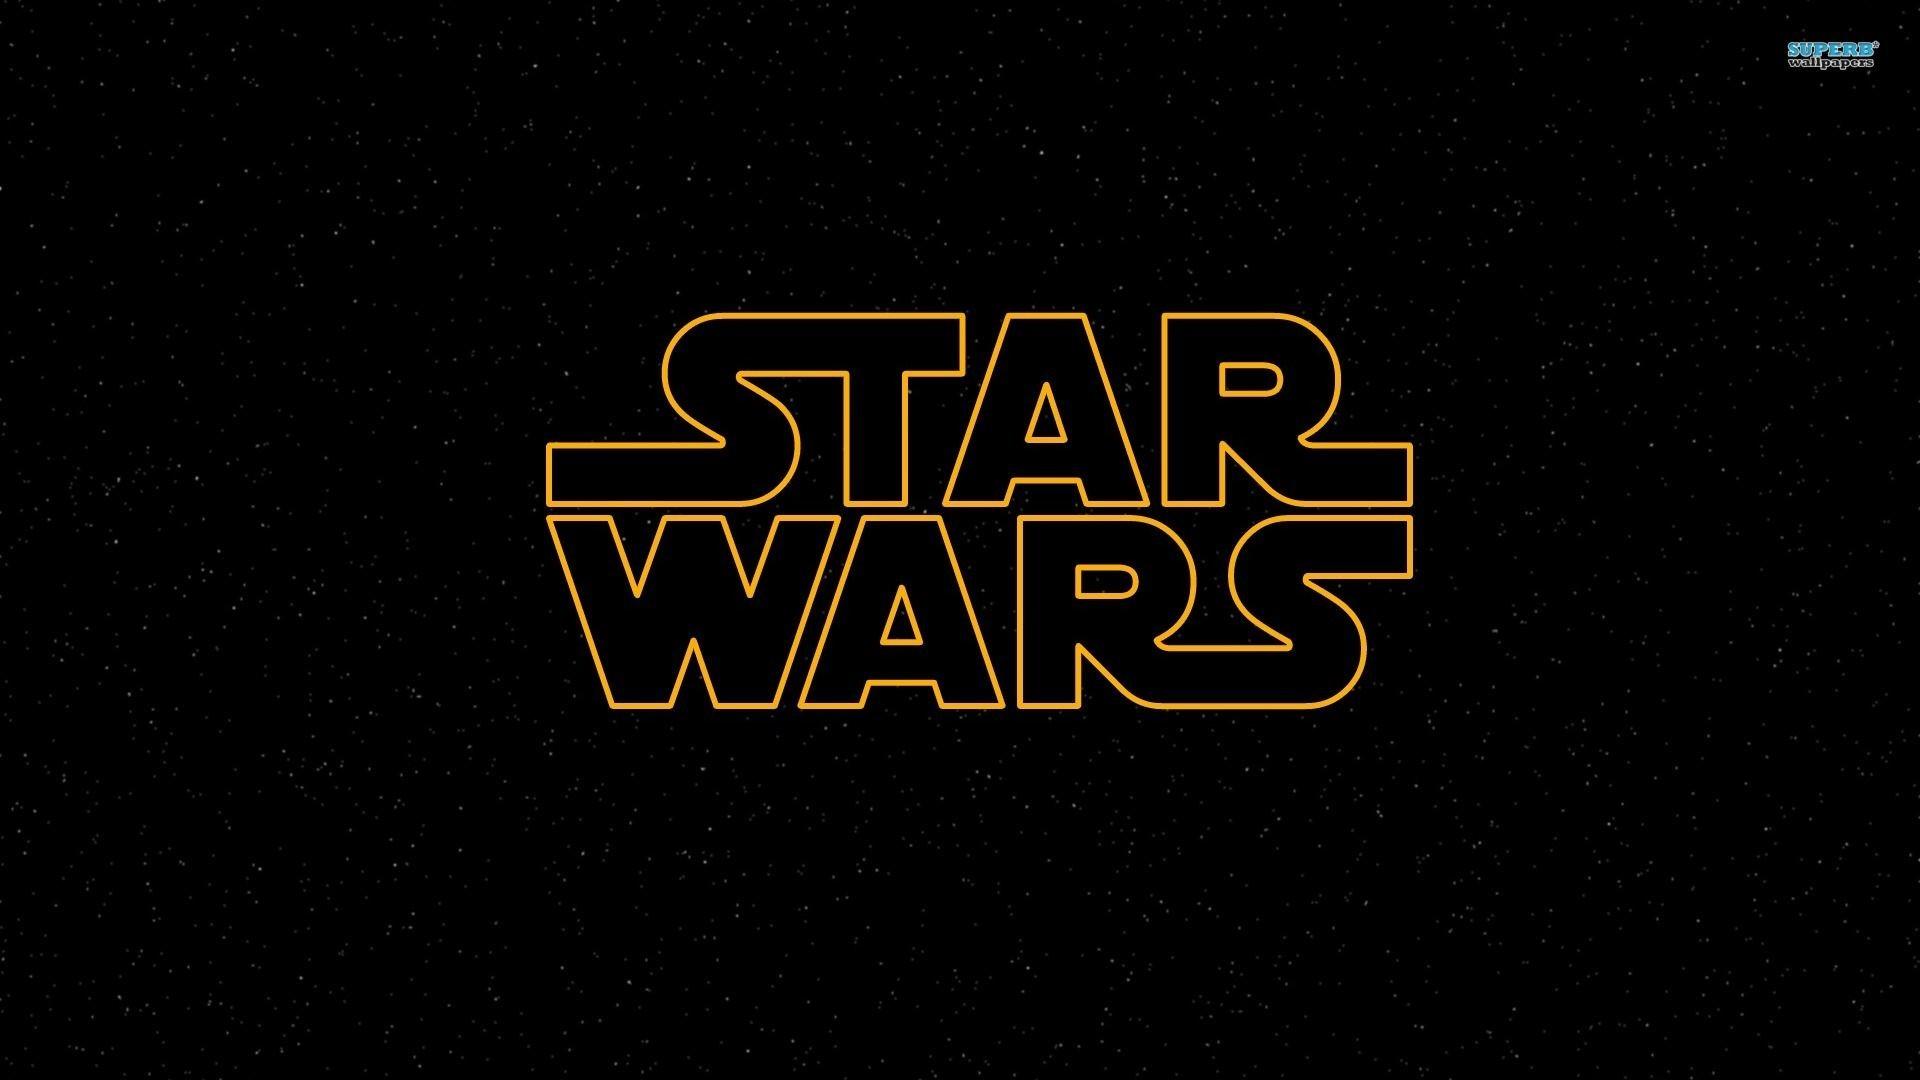 On KuBiPeT Graphics: JMU.67 Star Wars, 0.11 Mb